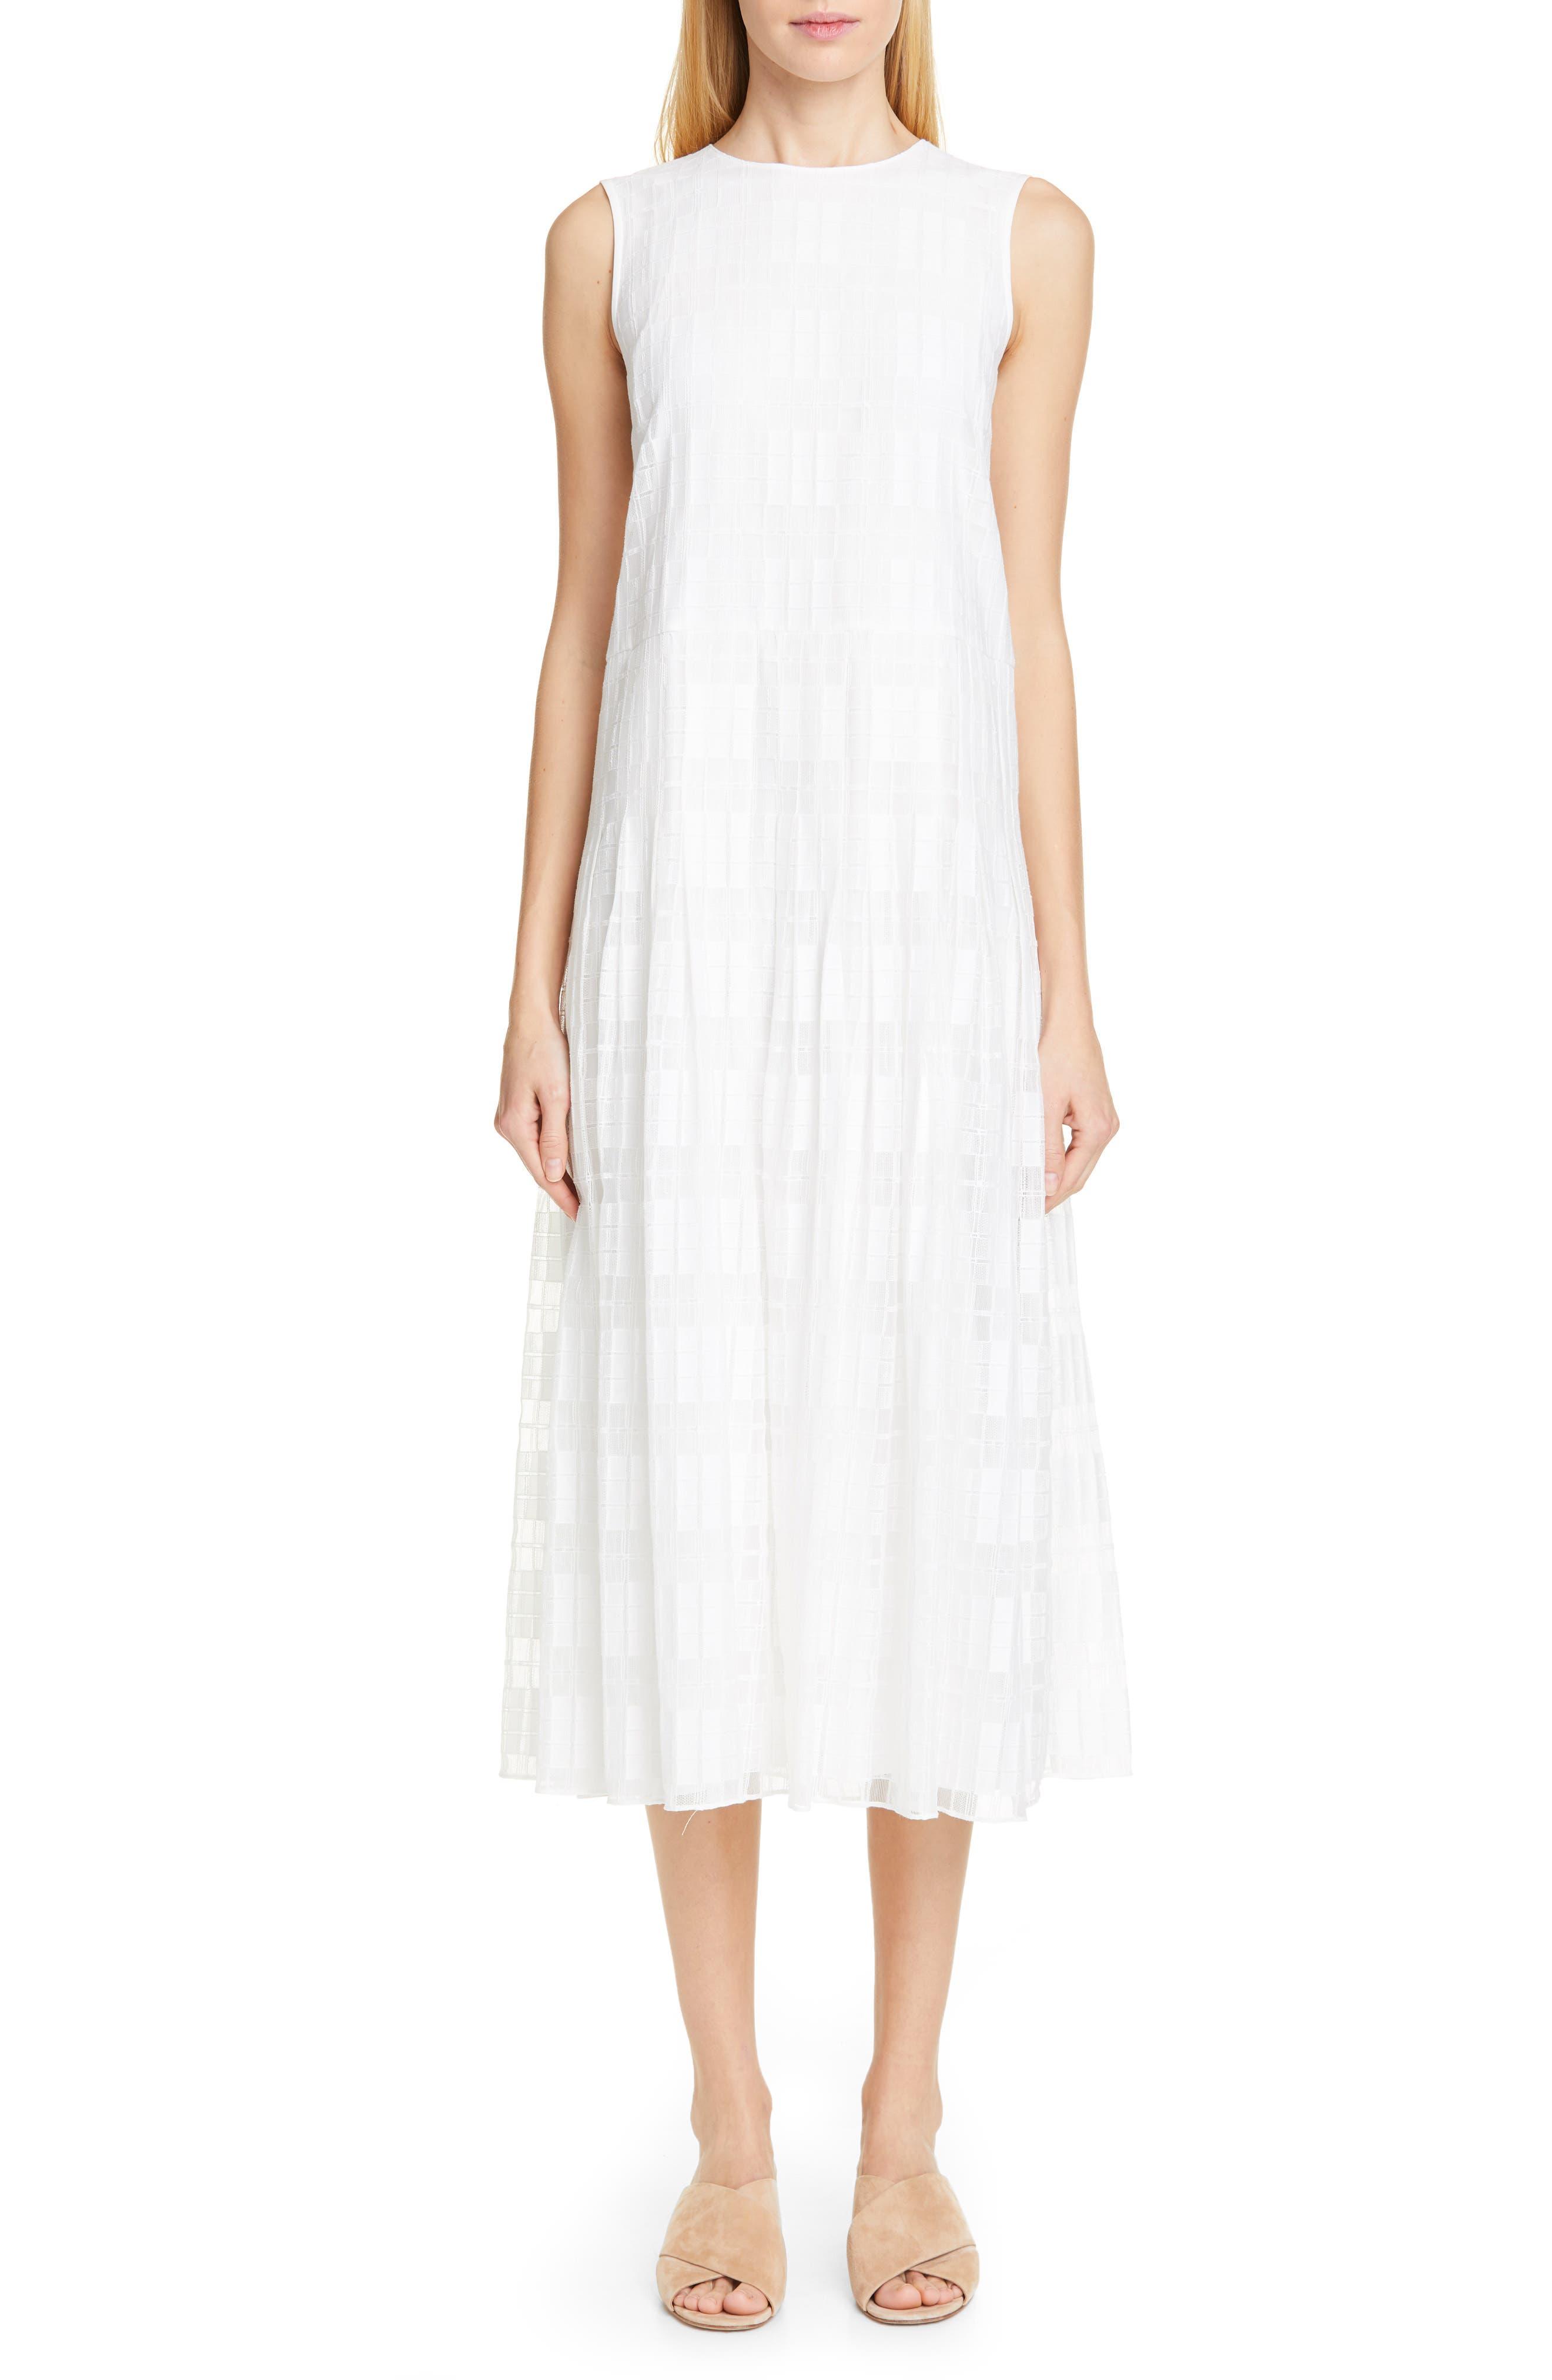 Lafayette 148 New York Avalynn Sleeveless Midi Dress, White